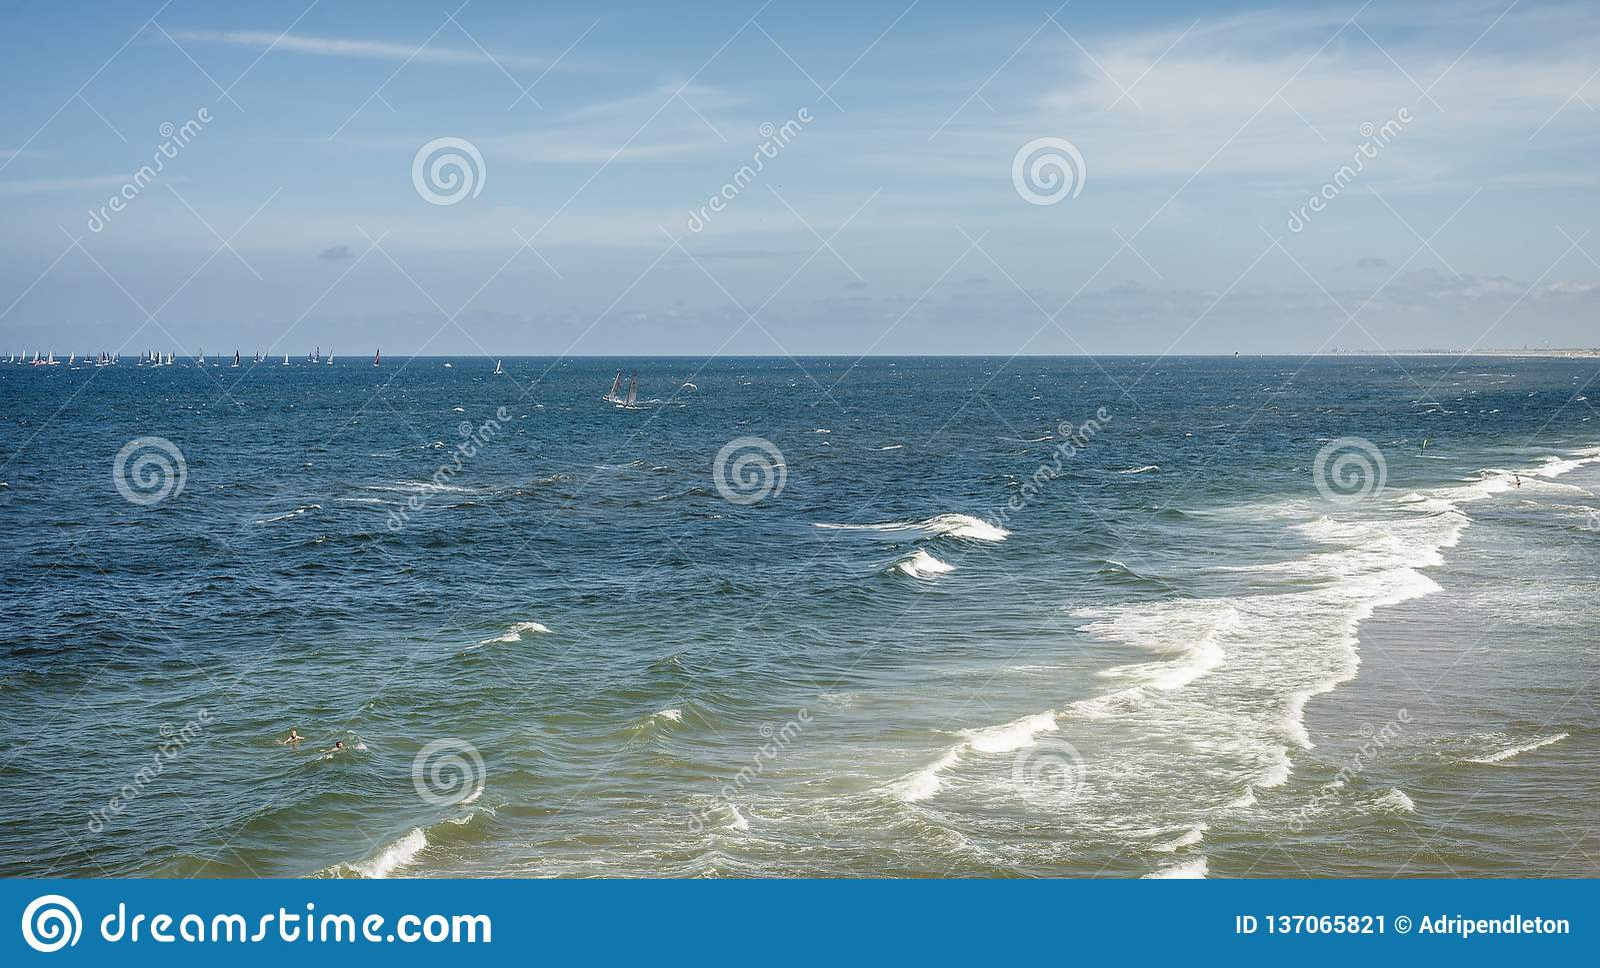 Blue Open Ocean Photo Of The North Sea Near The Shoreline ...